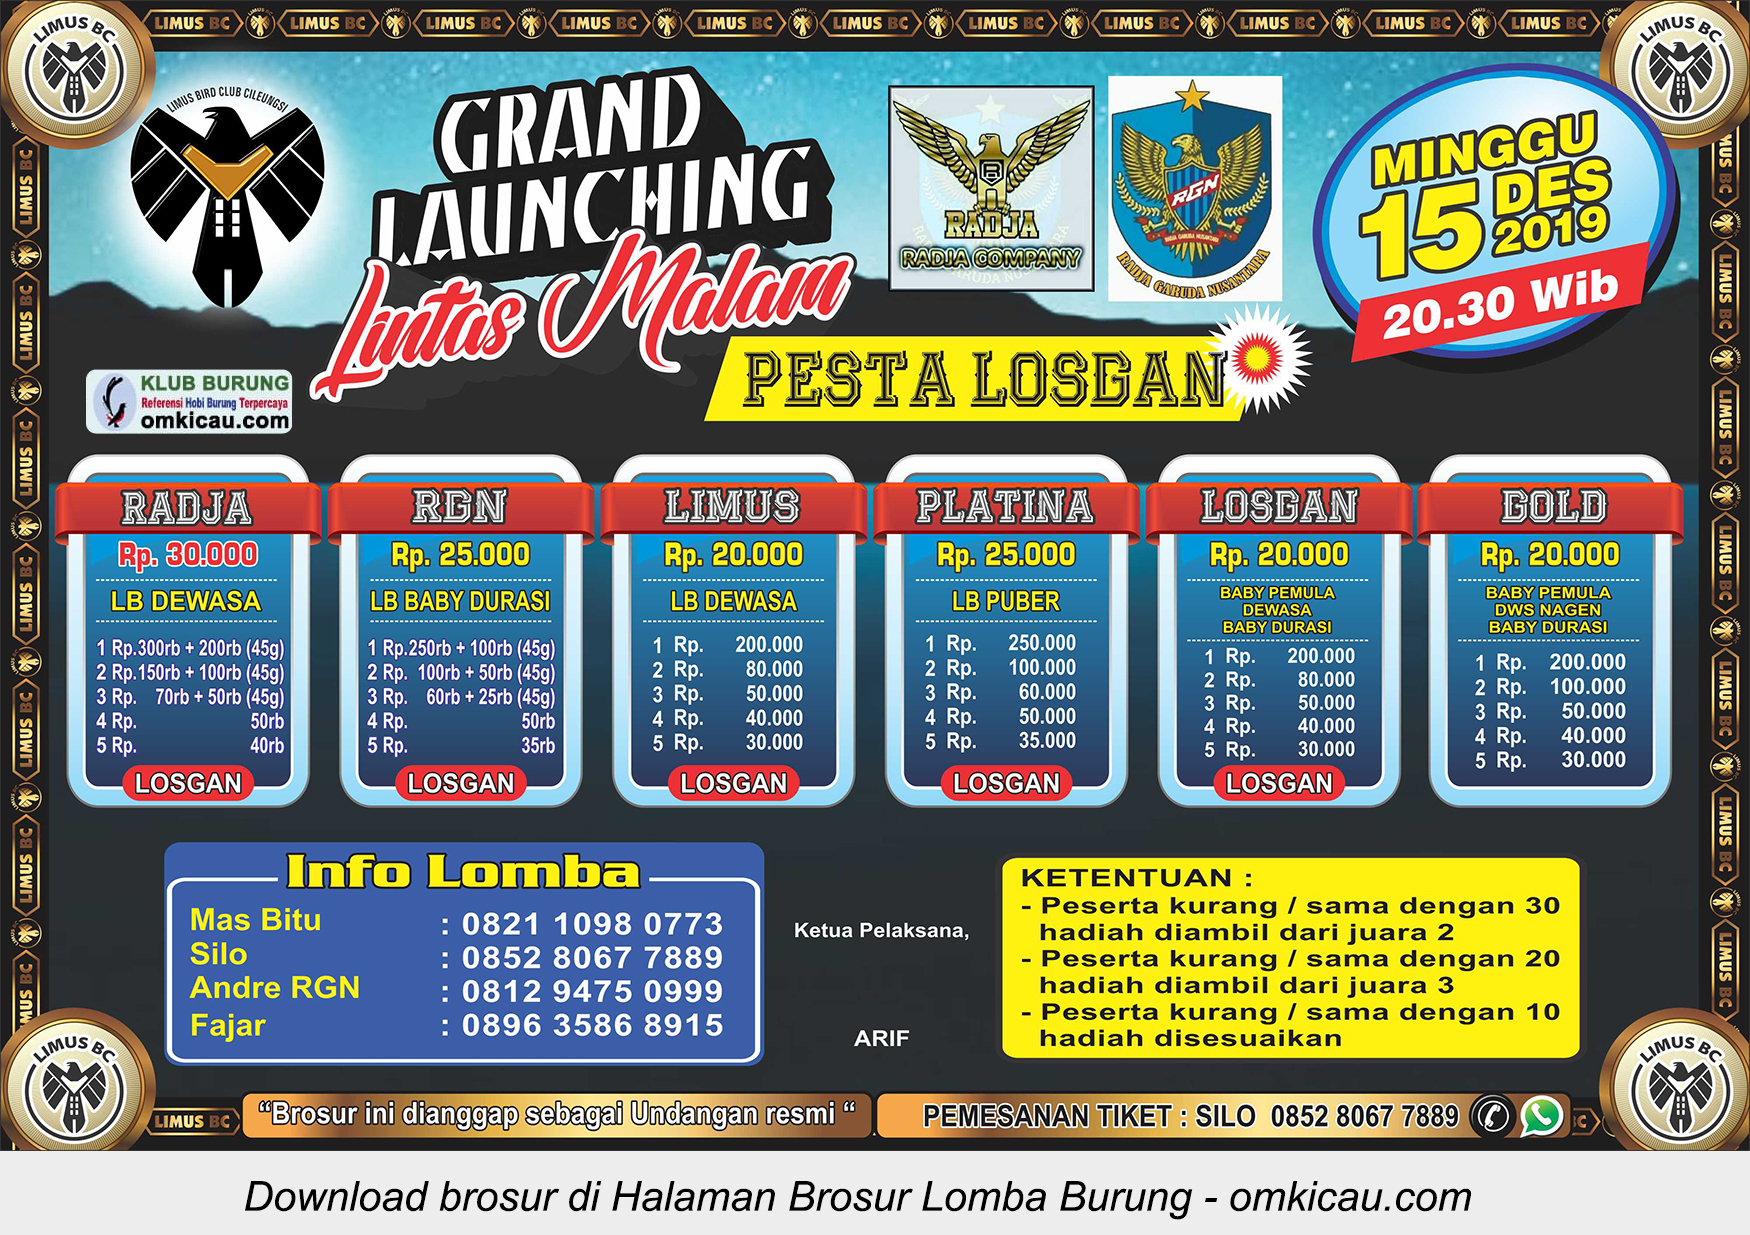 Grand Launching Lintas Malam